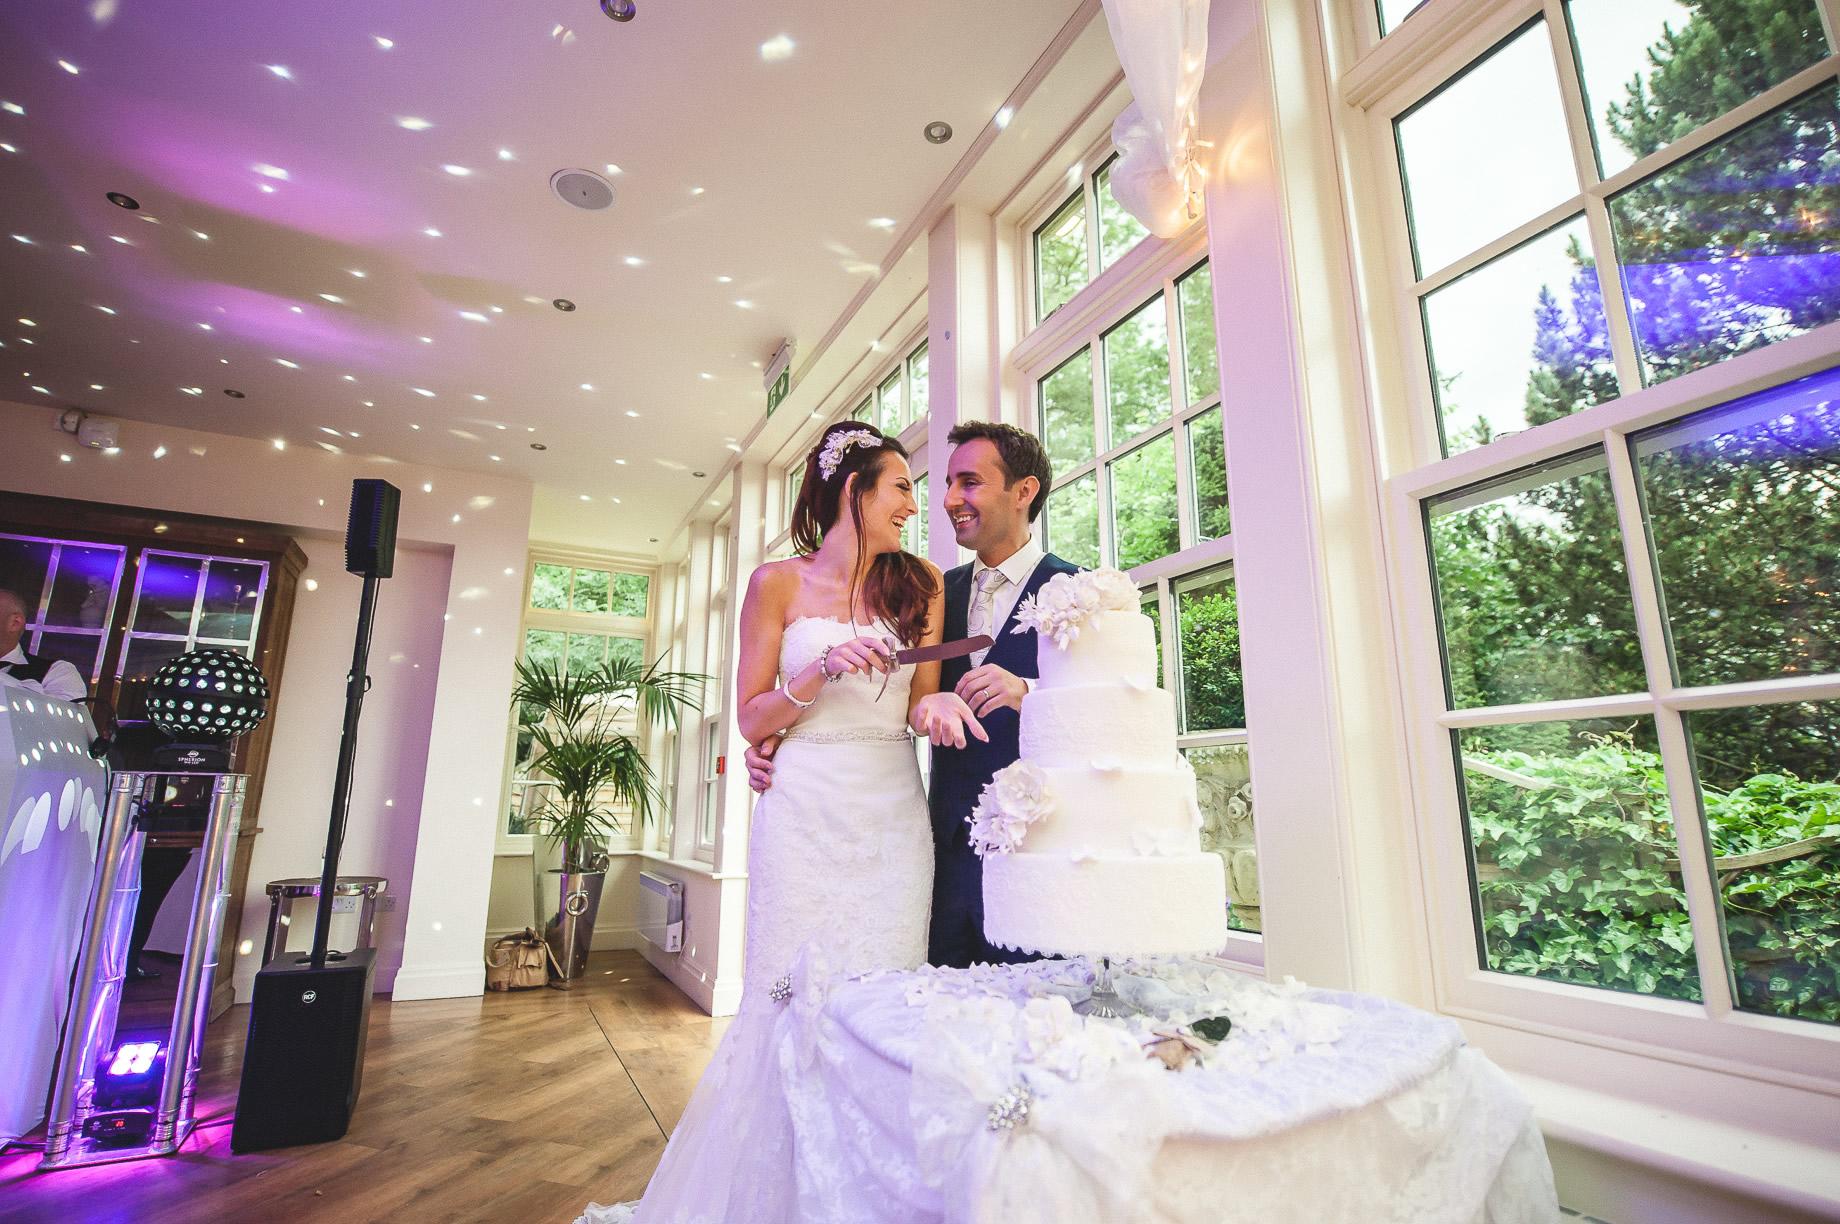 Helen and Matt's Wedding at Mitton Hall 124